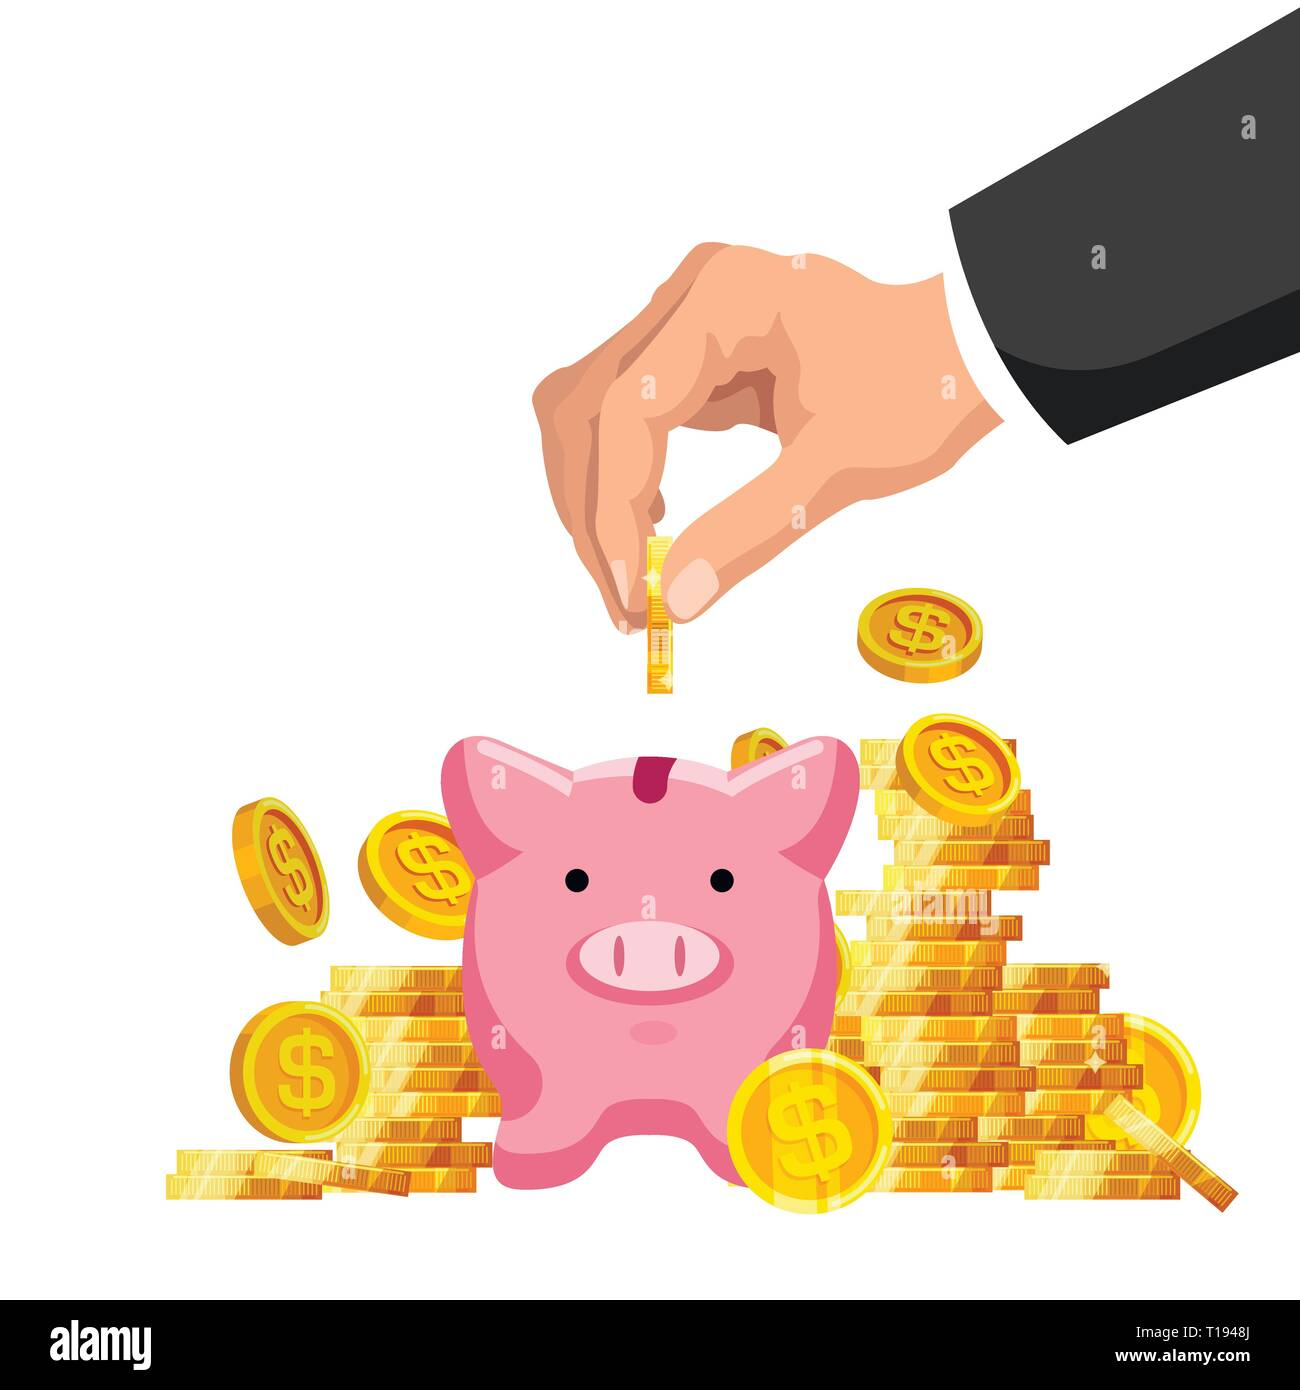 Geld sparen Konzept Stock Vektor